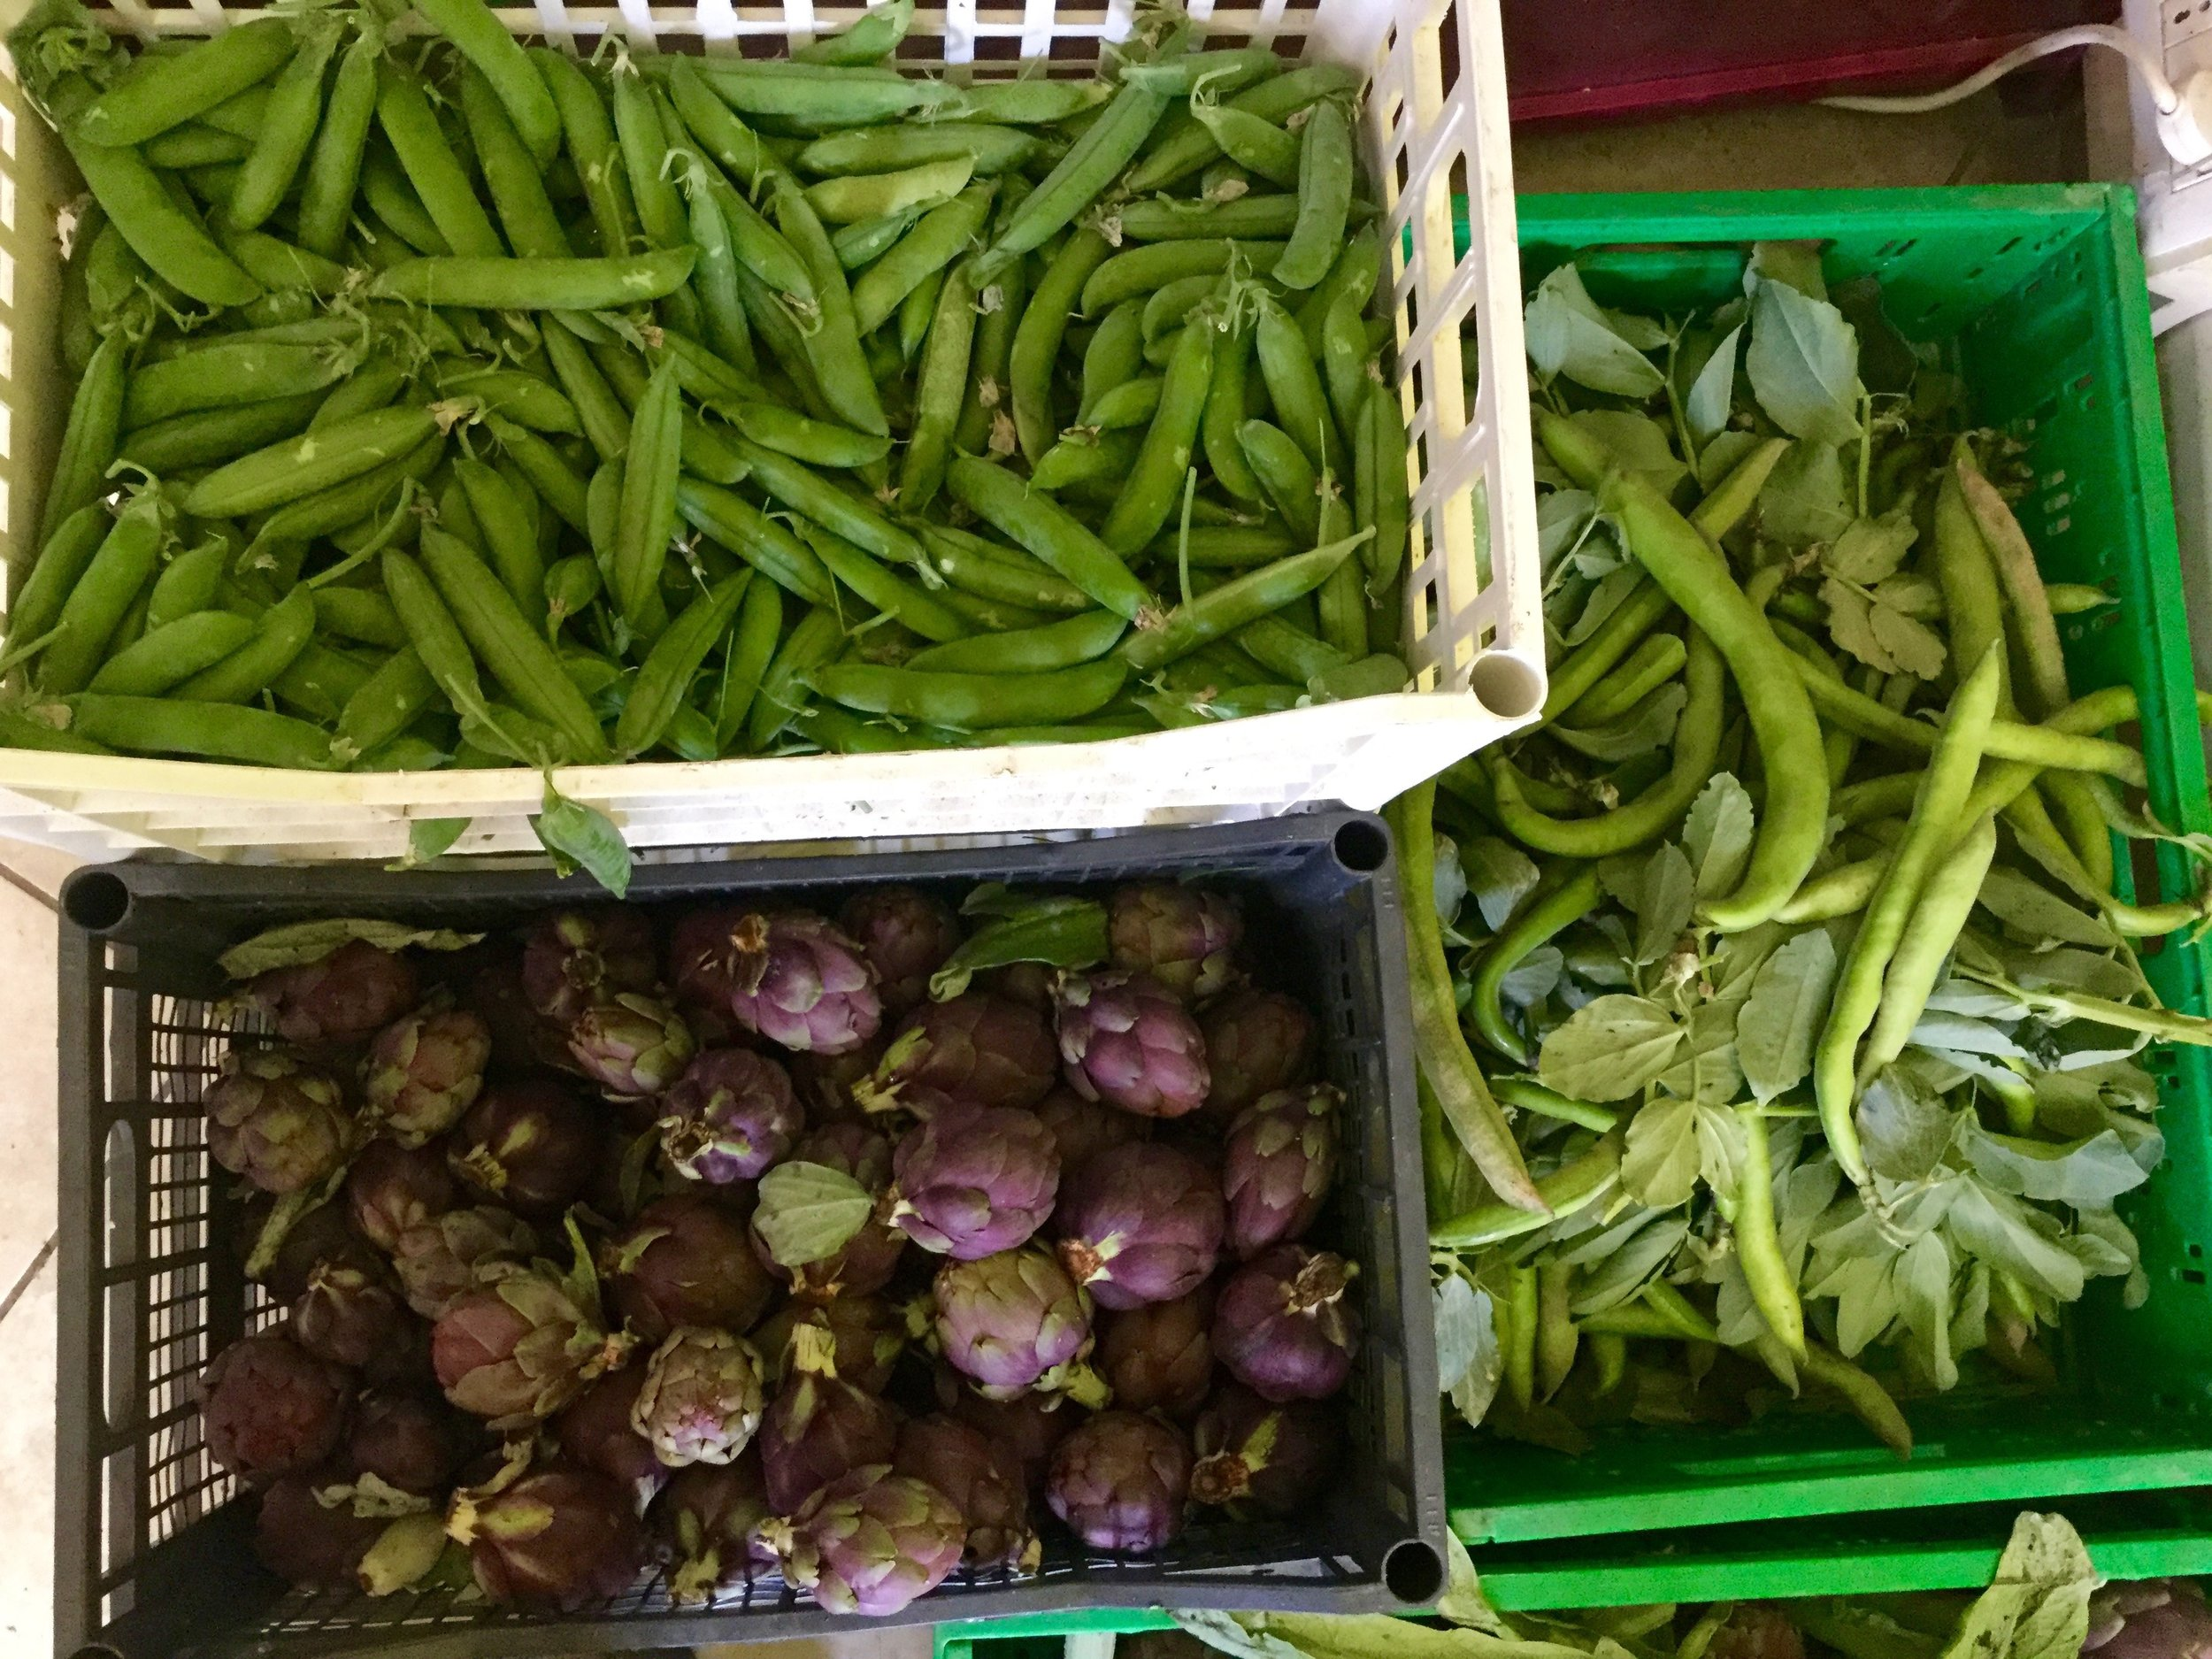 farmers-market_39135347684_o.jpg